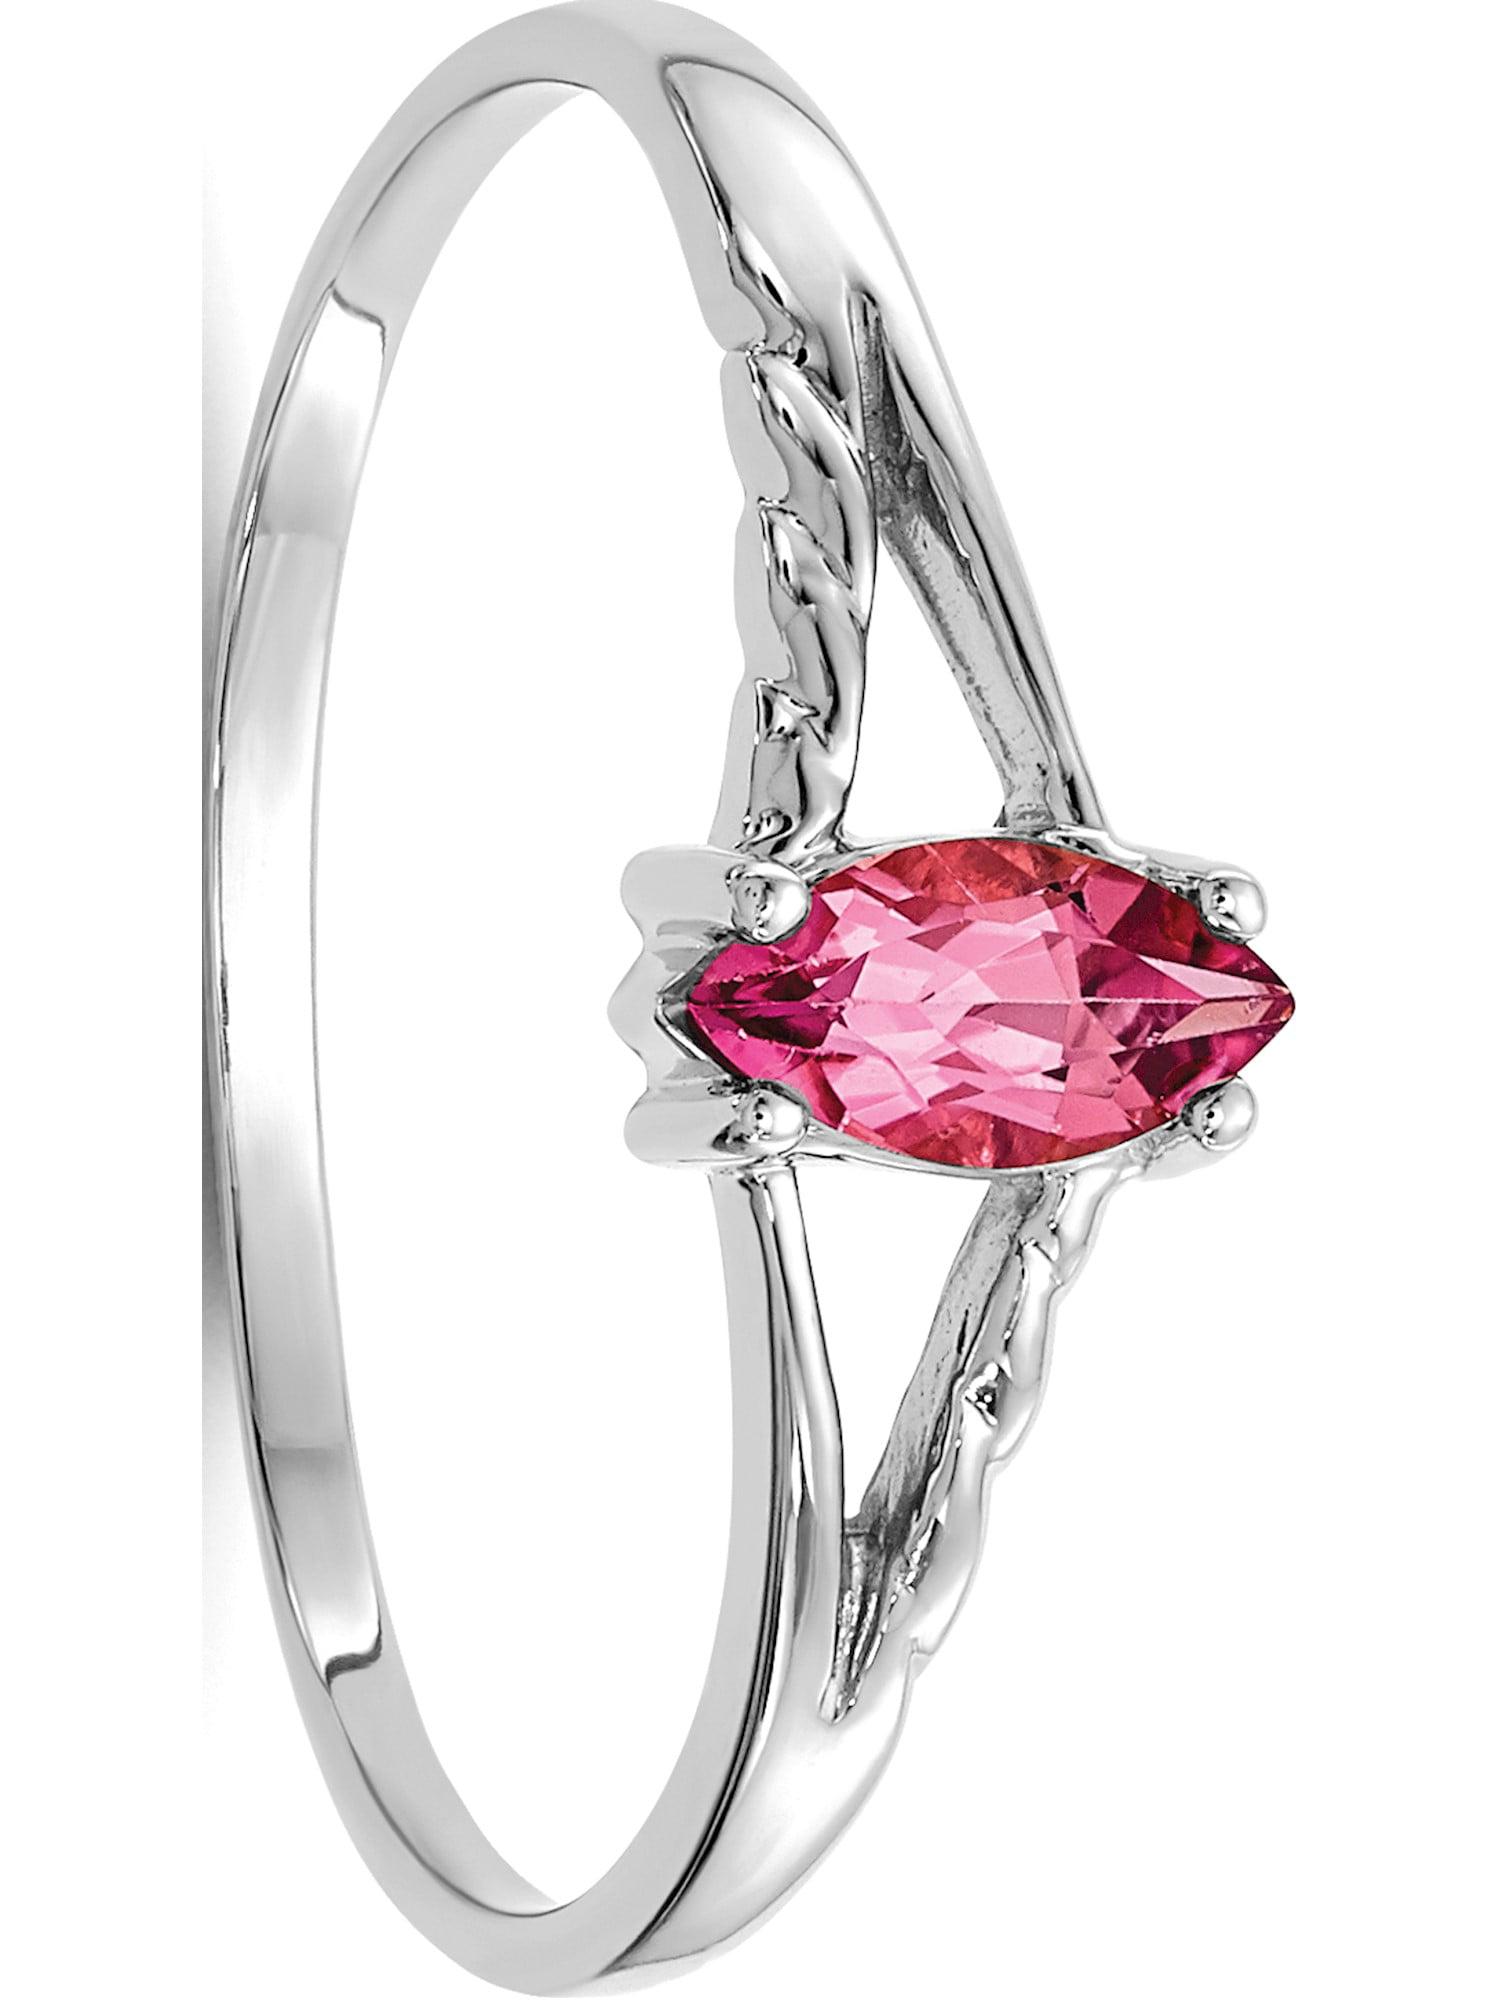 10k White Gold White Polished Geniune Pink Tourmaline Birthstone Ring by